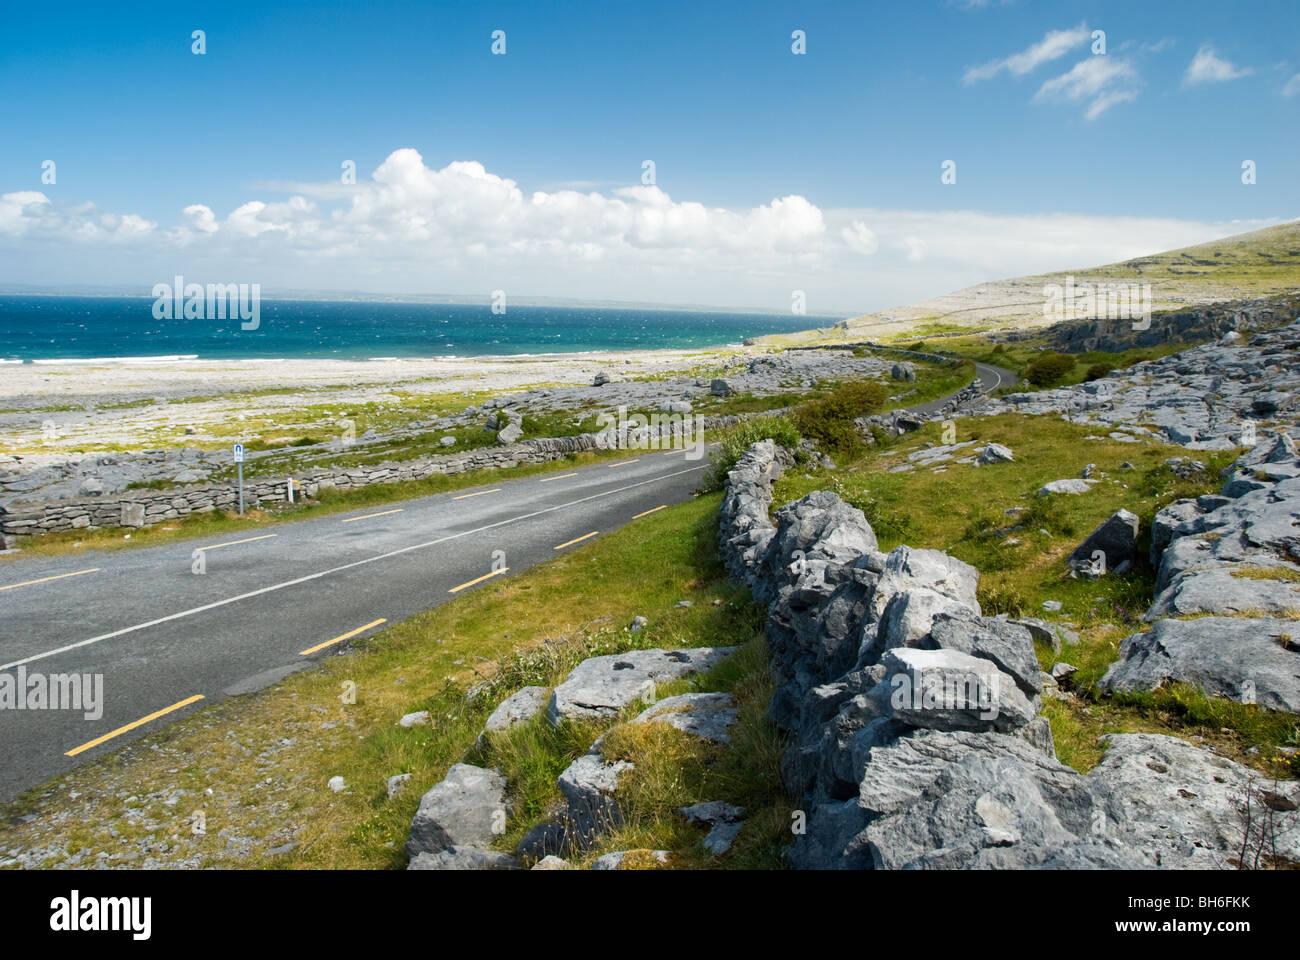 The coastal road in the Burren, looking towards Black head. Stock Photo